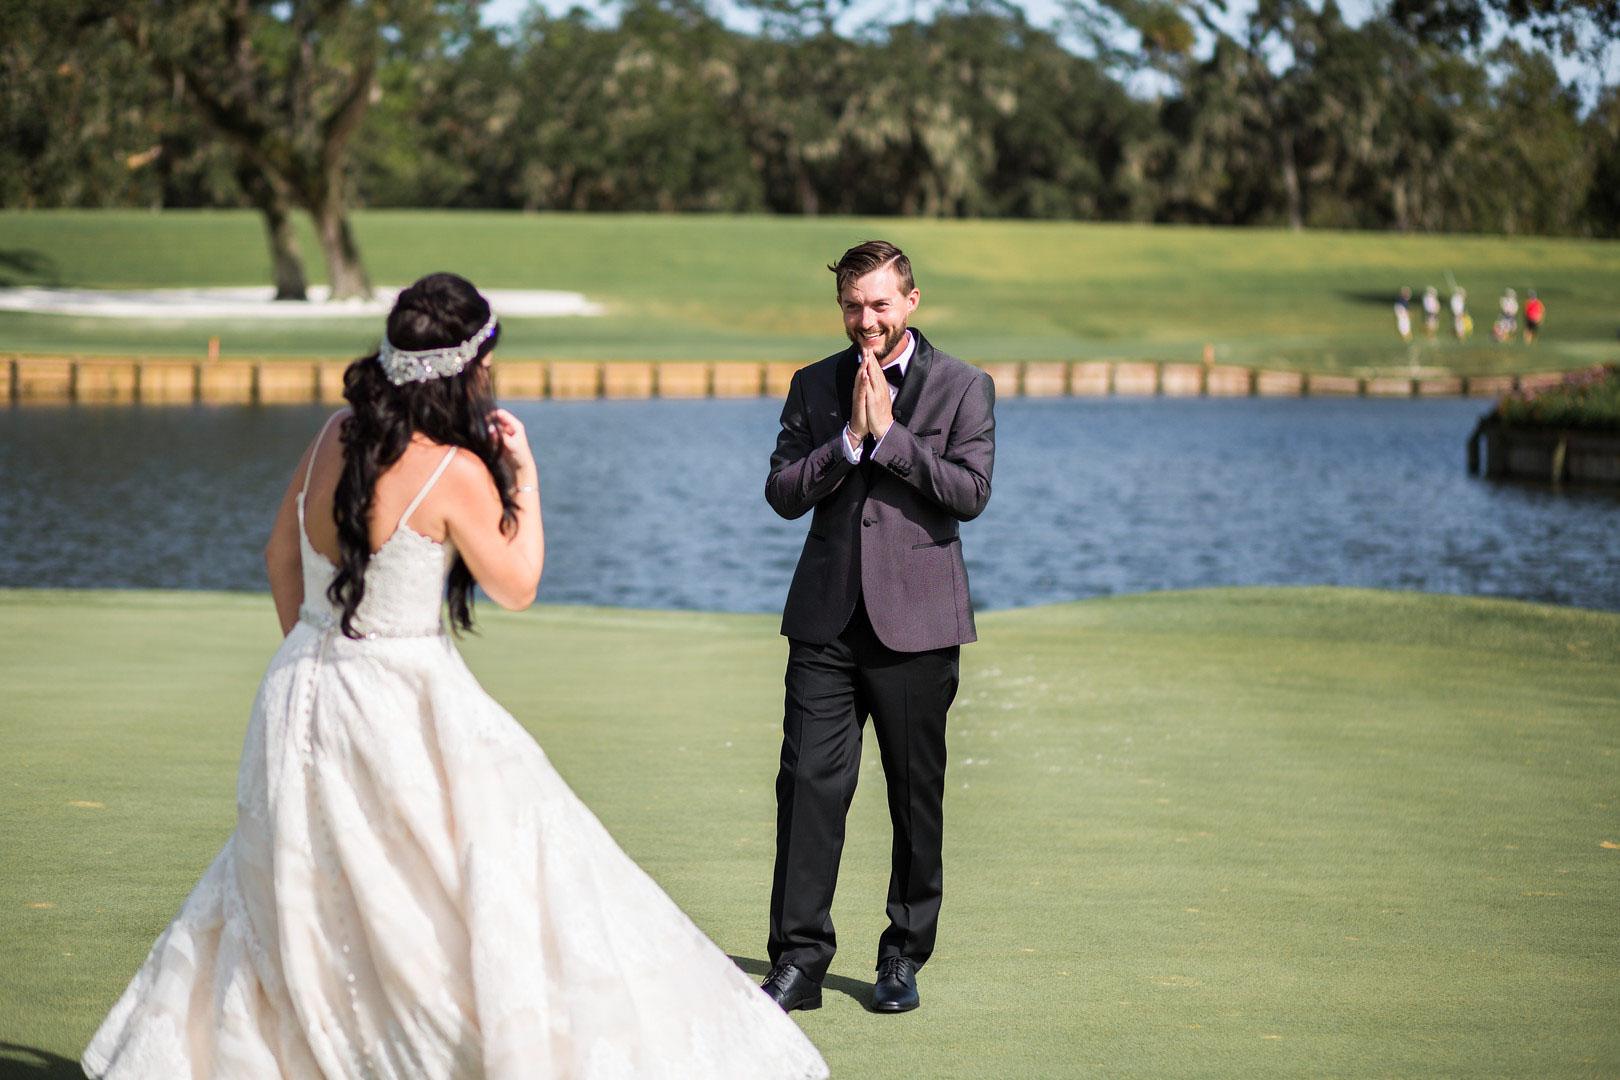 Clubhouse-TPC-Sawgrass-Wedding-Photographer-Adam-Szarmack-44.jpg